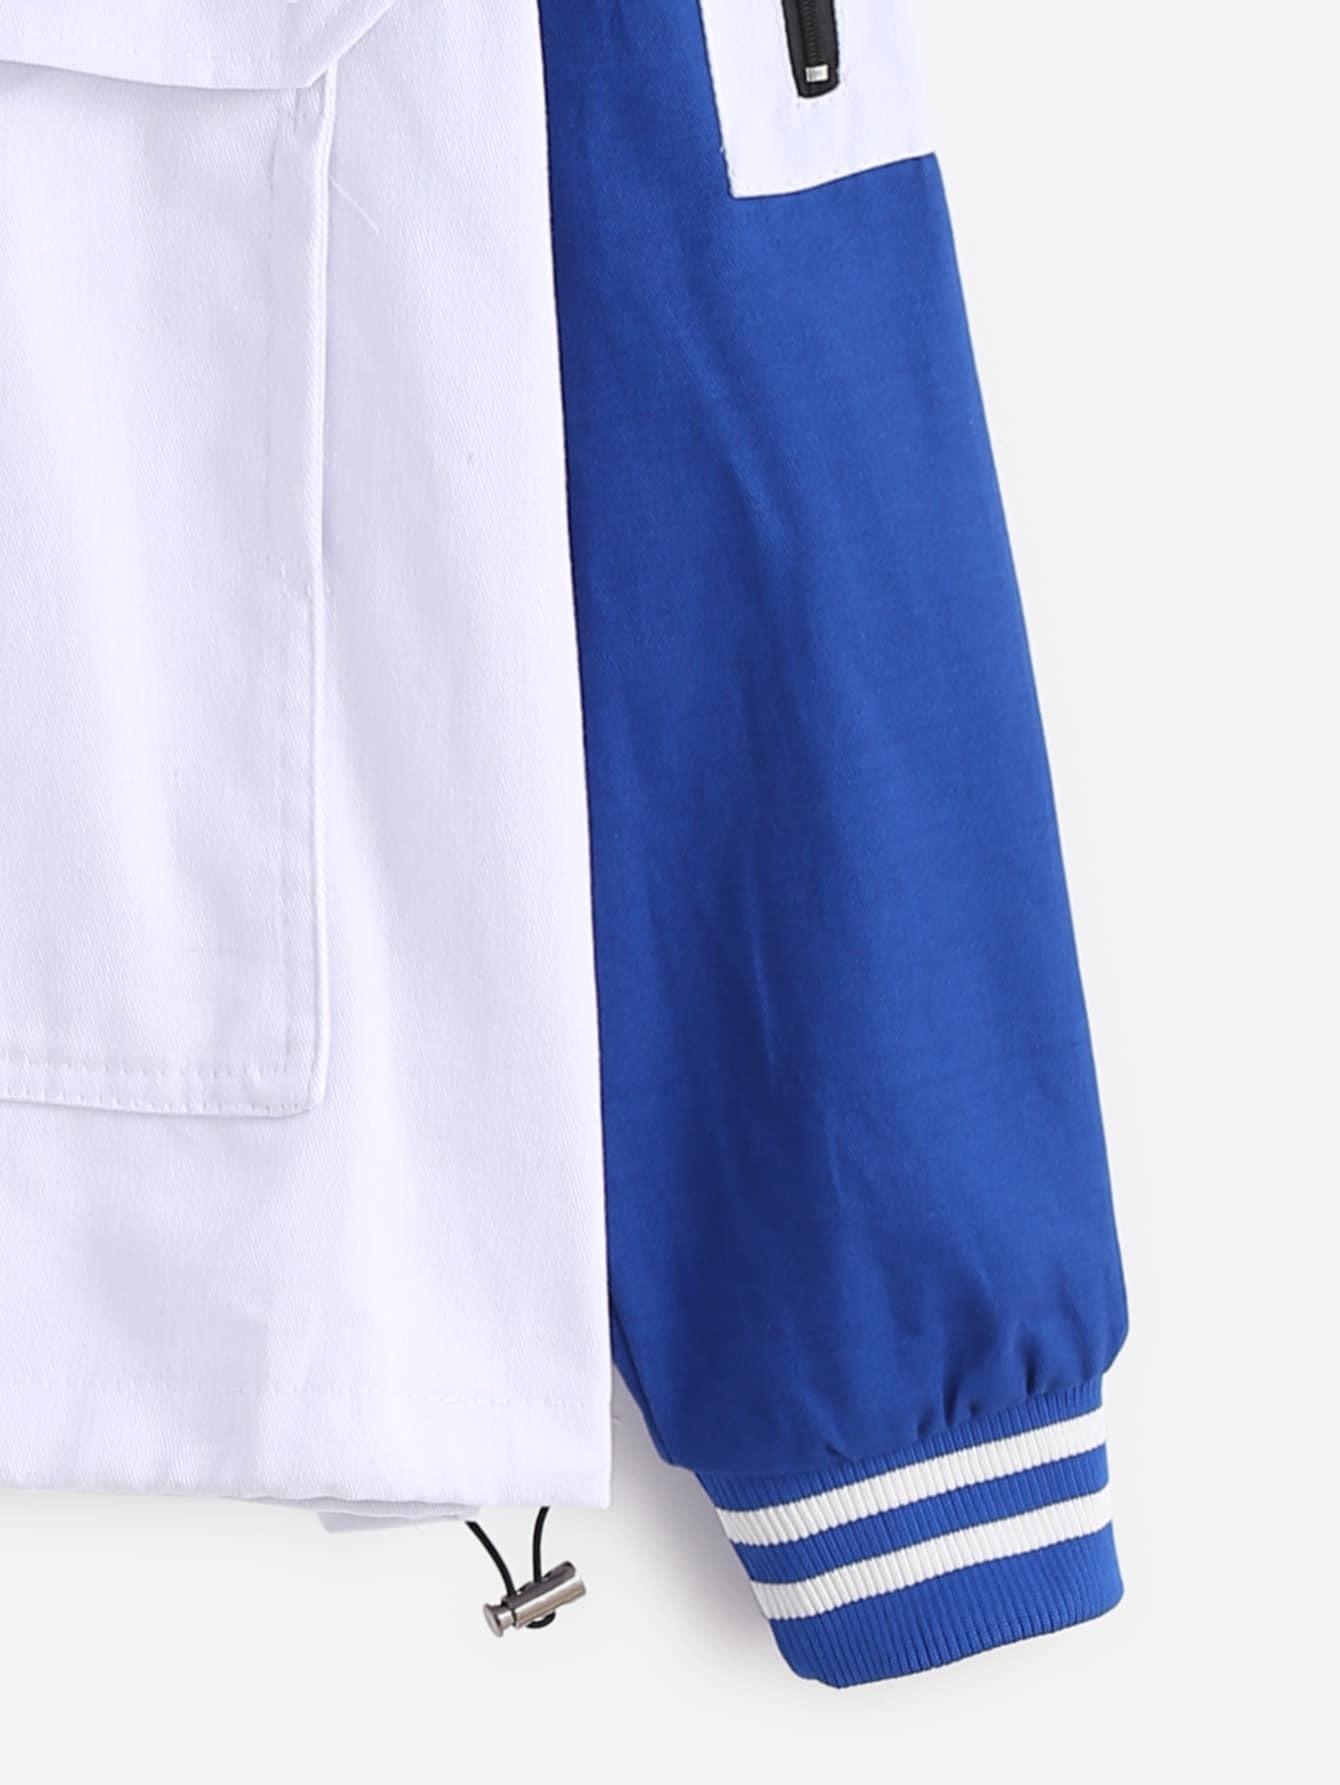 Royal Blue Contrast Letters Print Pocket Hooded Sweatshirt